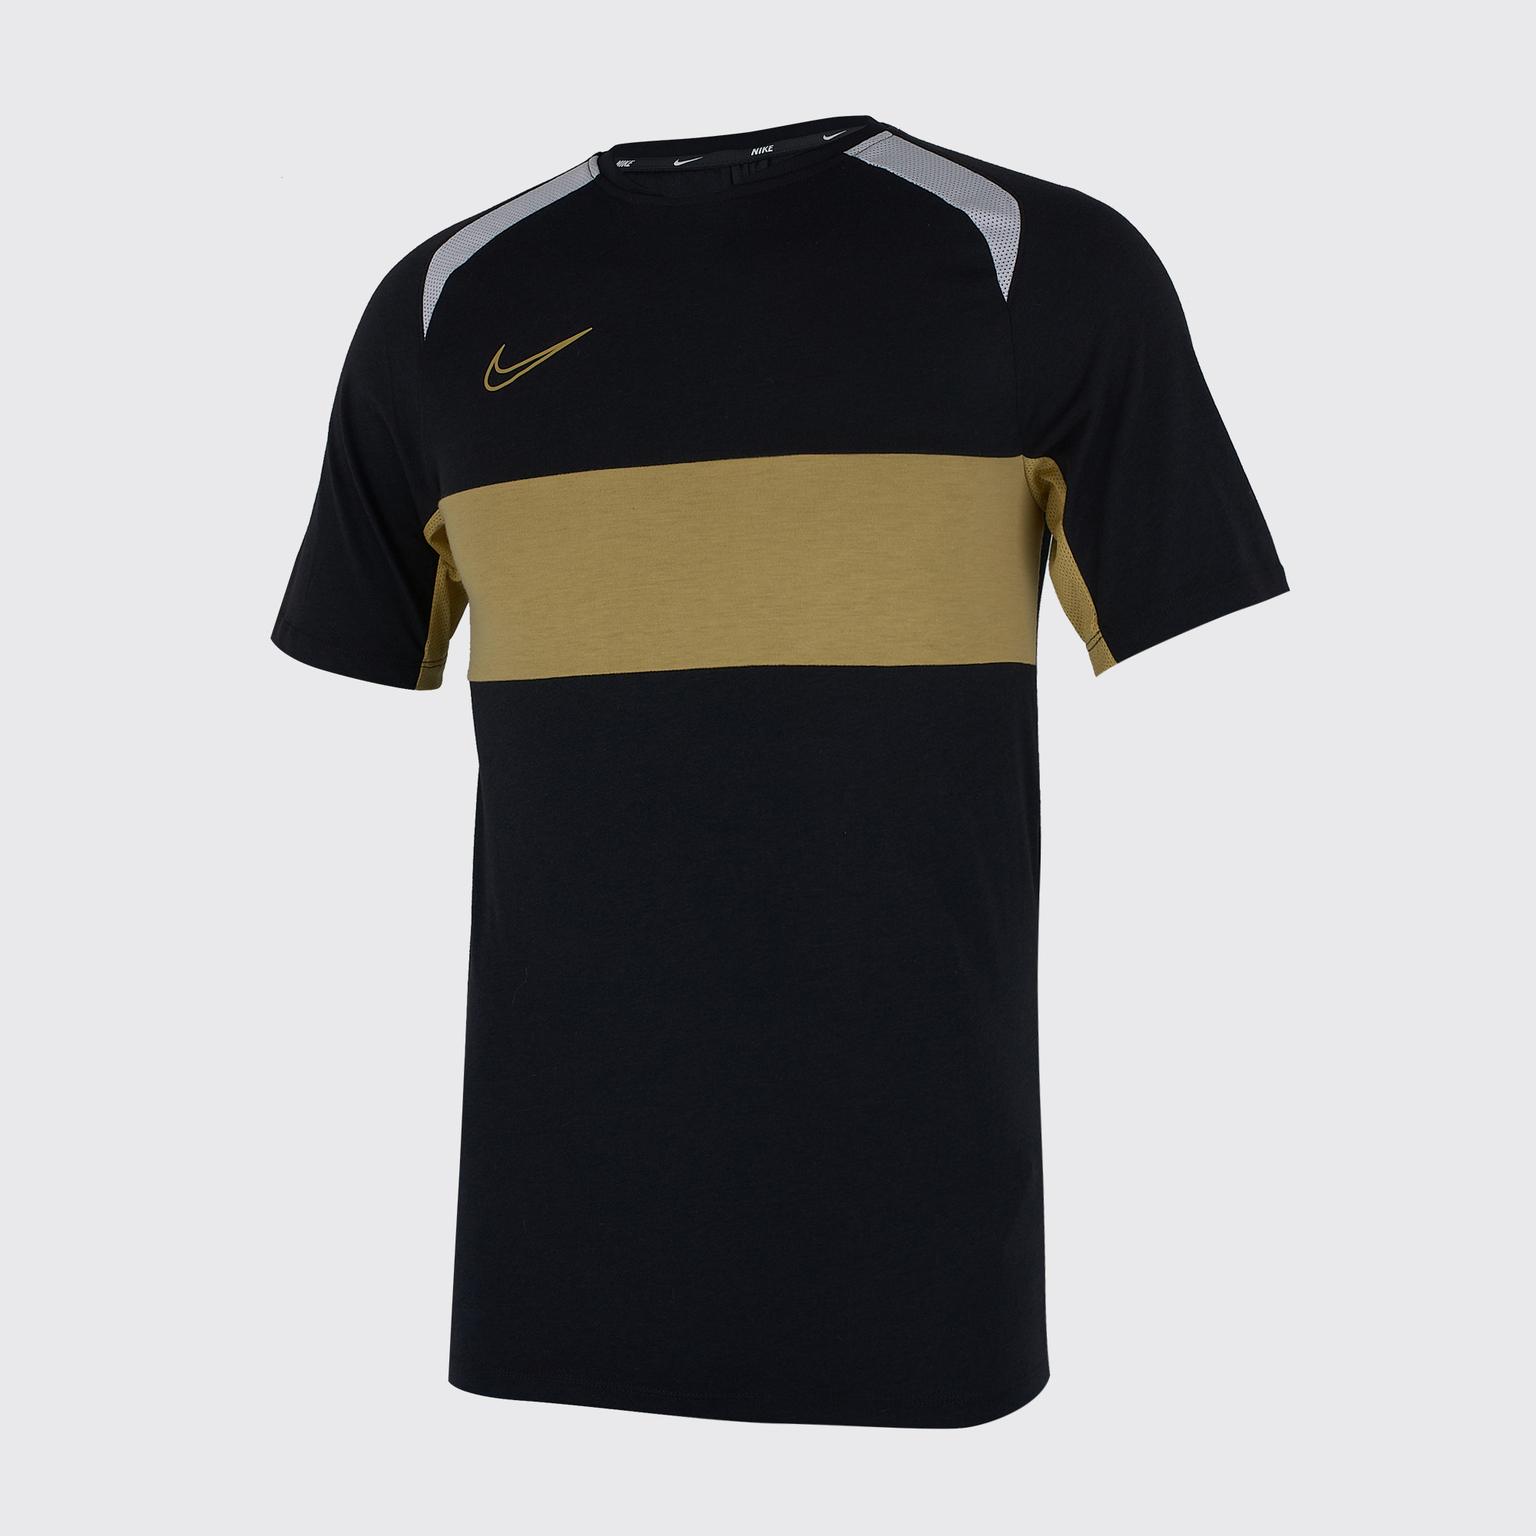 Футболка тренировочная Nike Dry Academy Top BQ7352-010 цена 2017